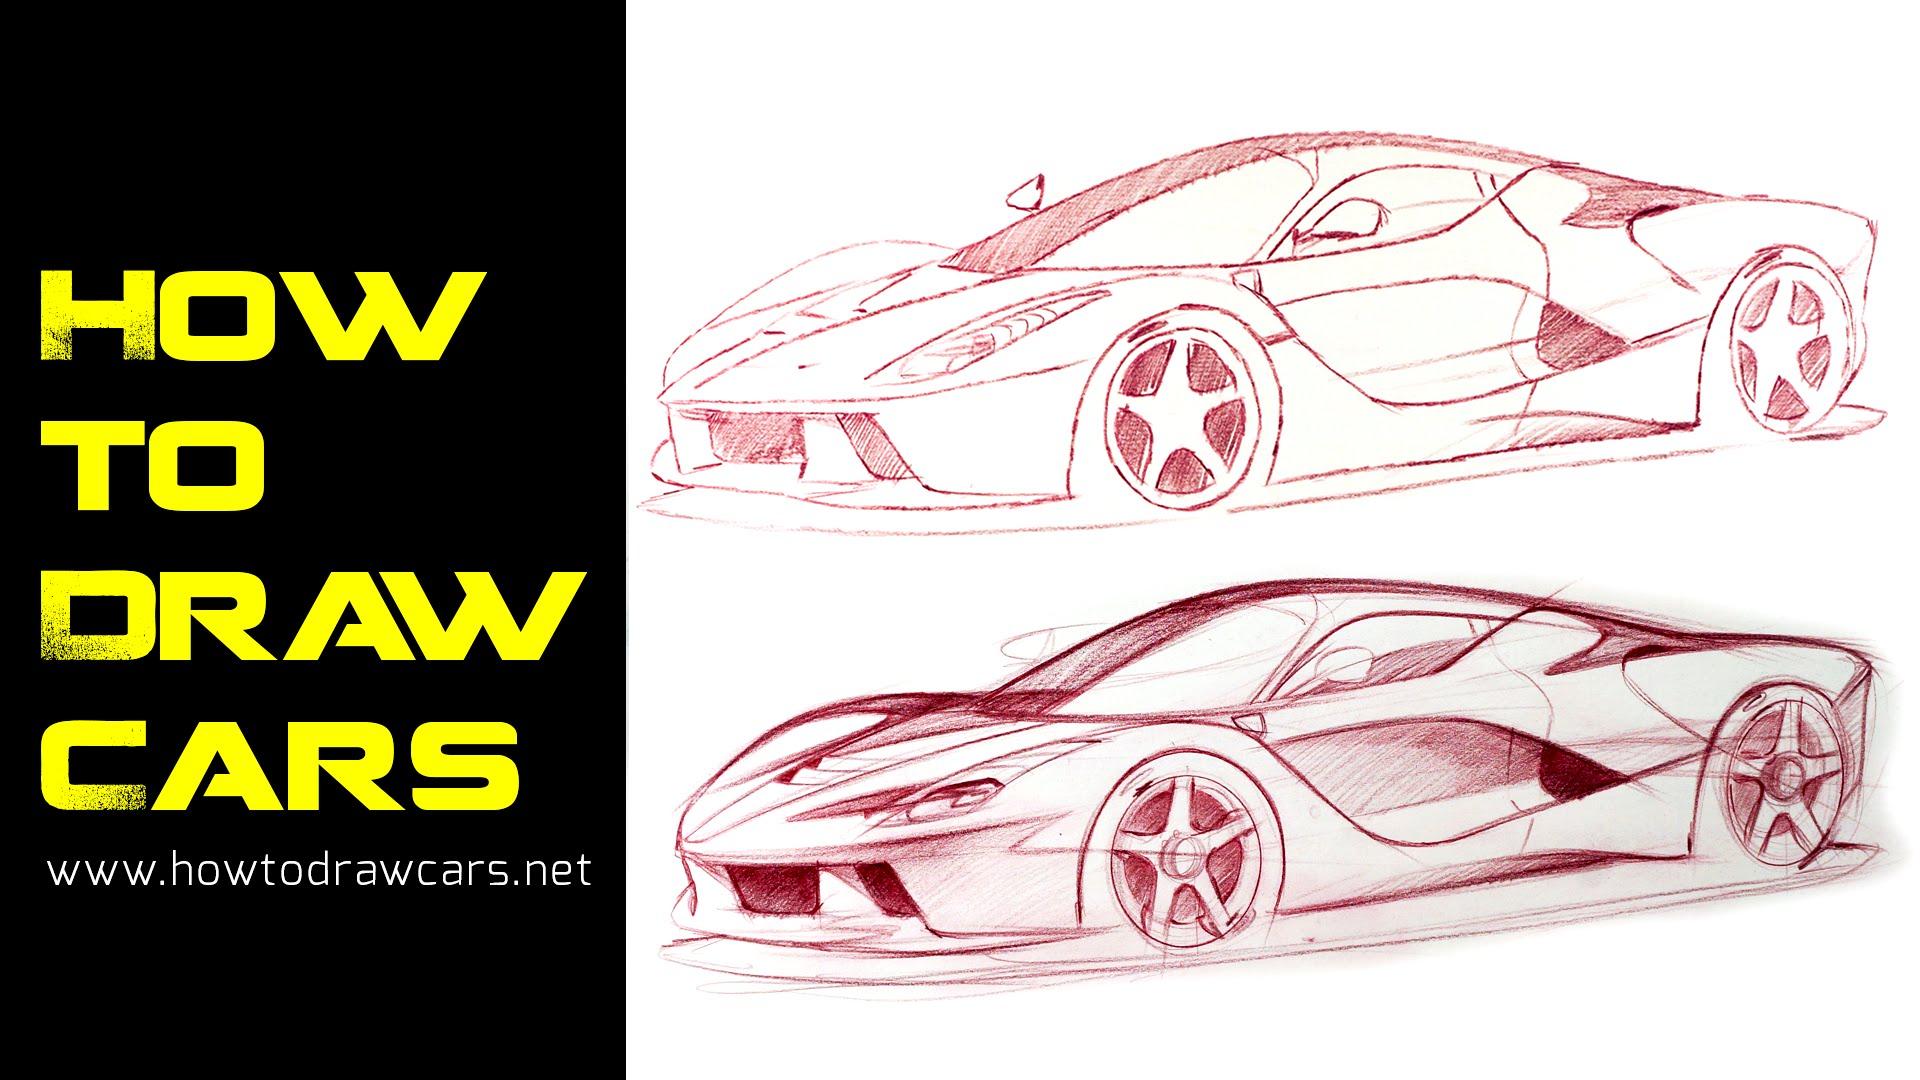 Drawn vehicle car design Pt 1 Secrets Design Drawings